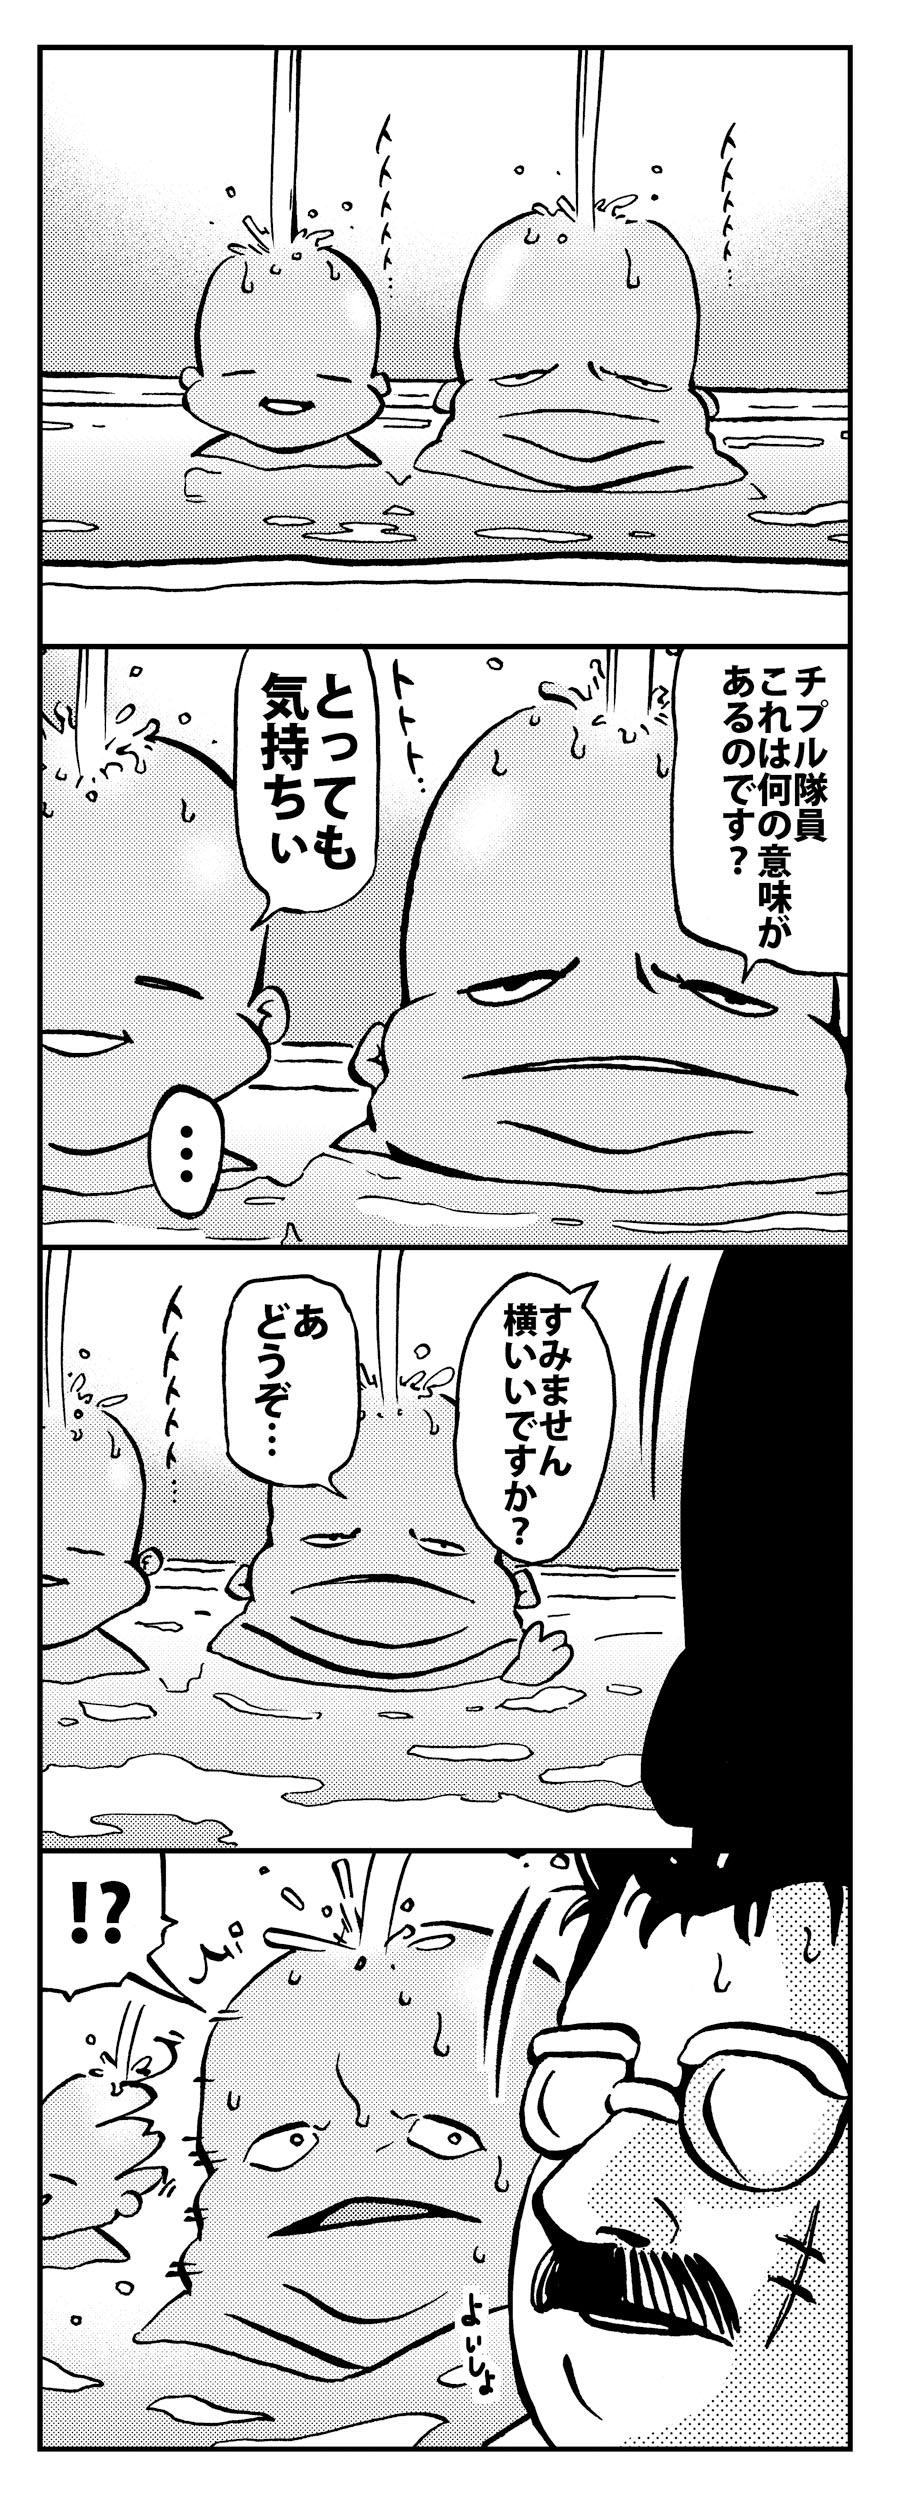 hippseijin_manga_02_05